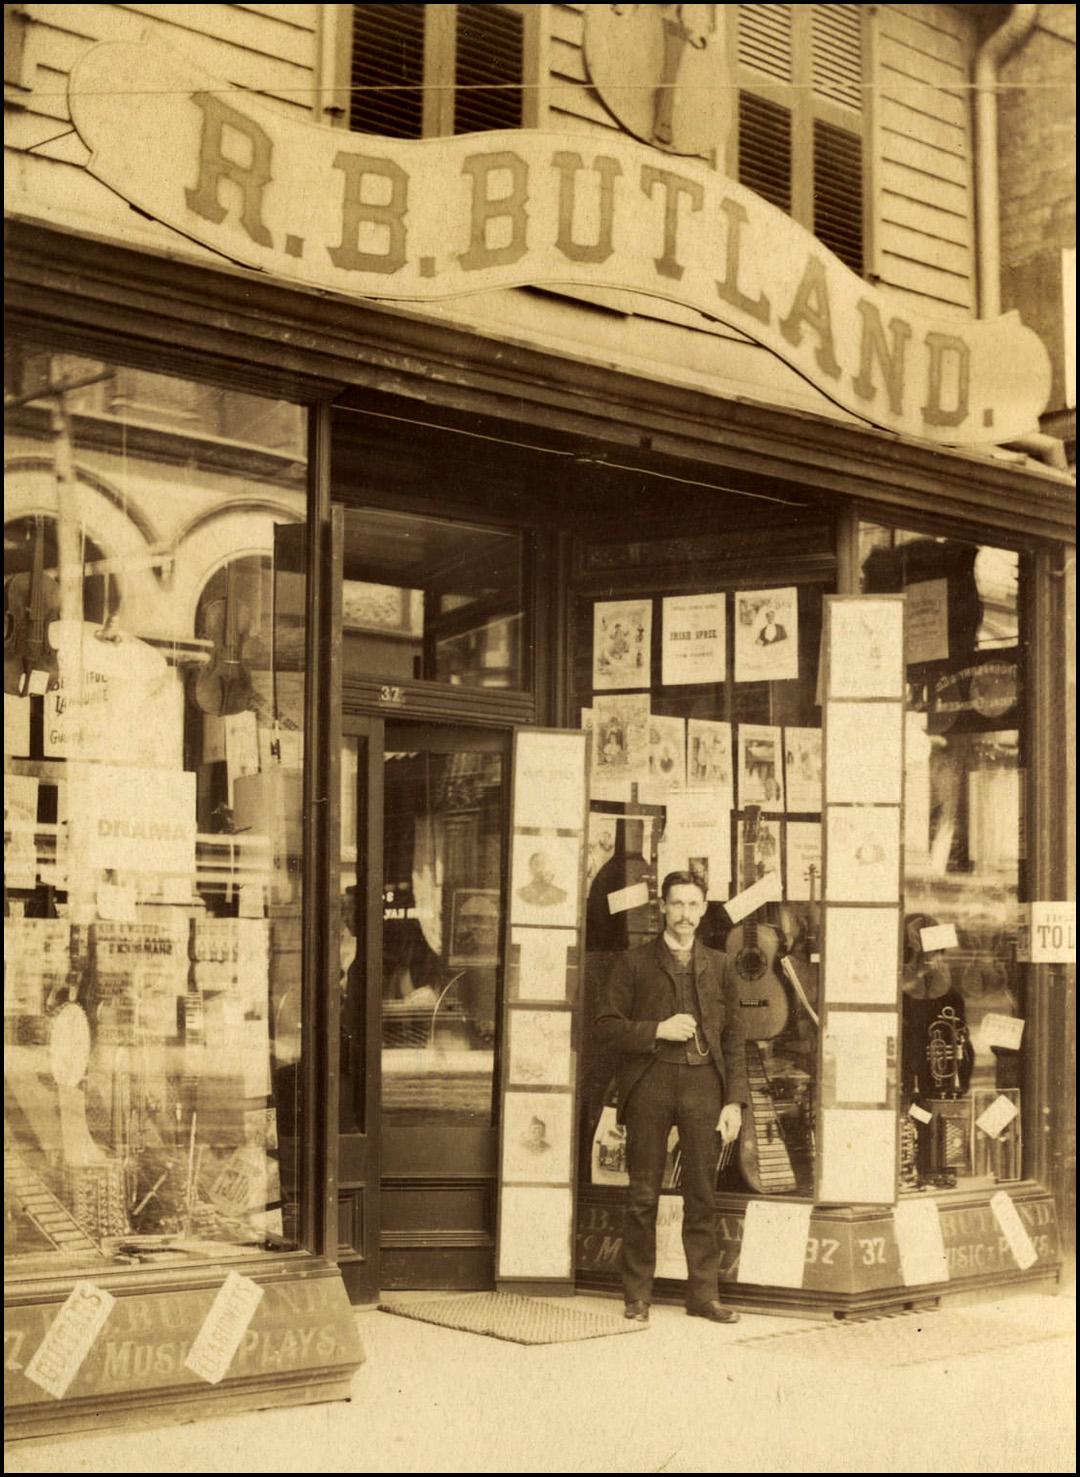 Butland, R.B. music dealer King St. W. south side between Jordan & Bay Sts. 1890.jpg